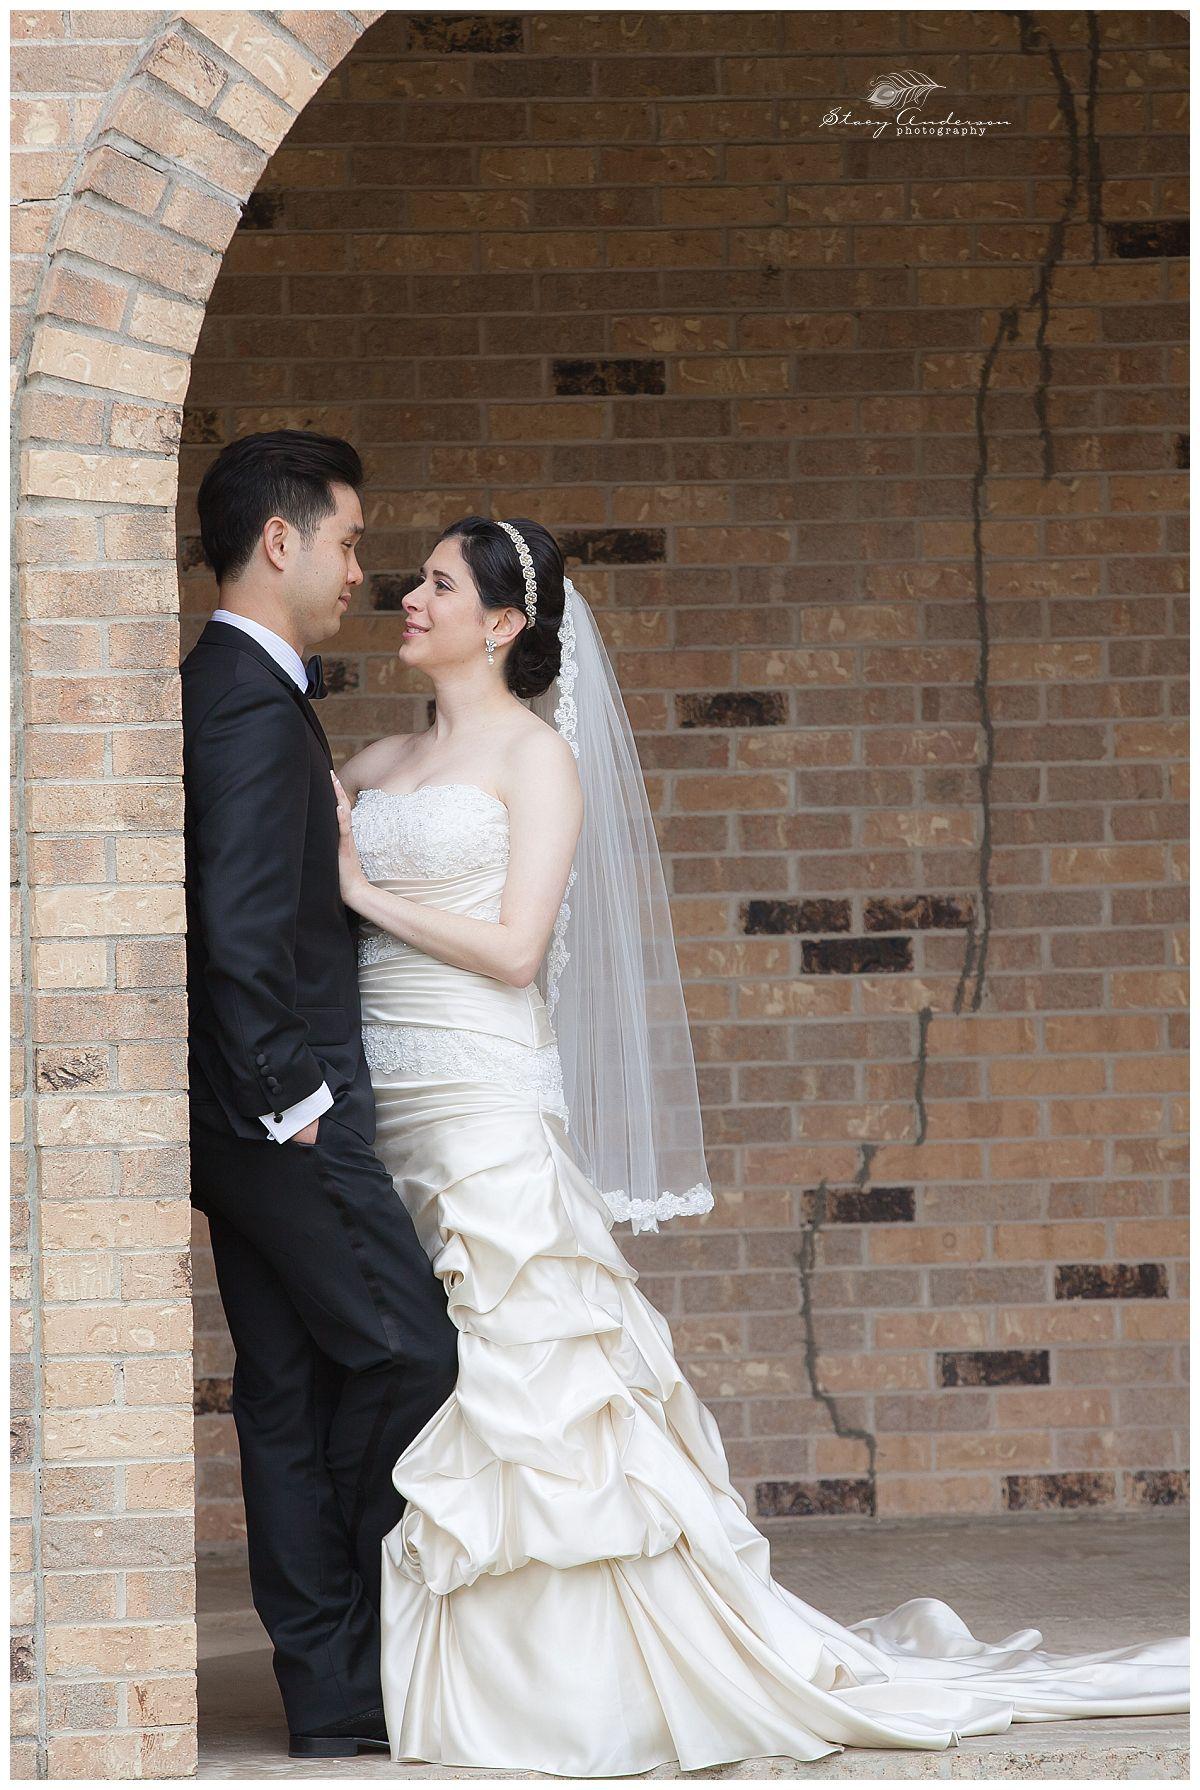 St. John Vianney Catholic Church wedding photographer / Stacy ...